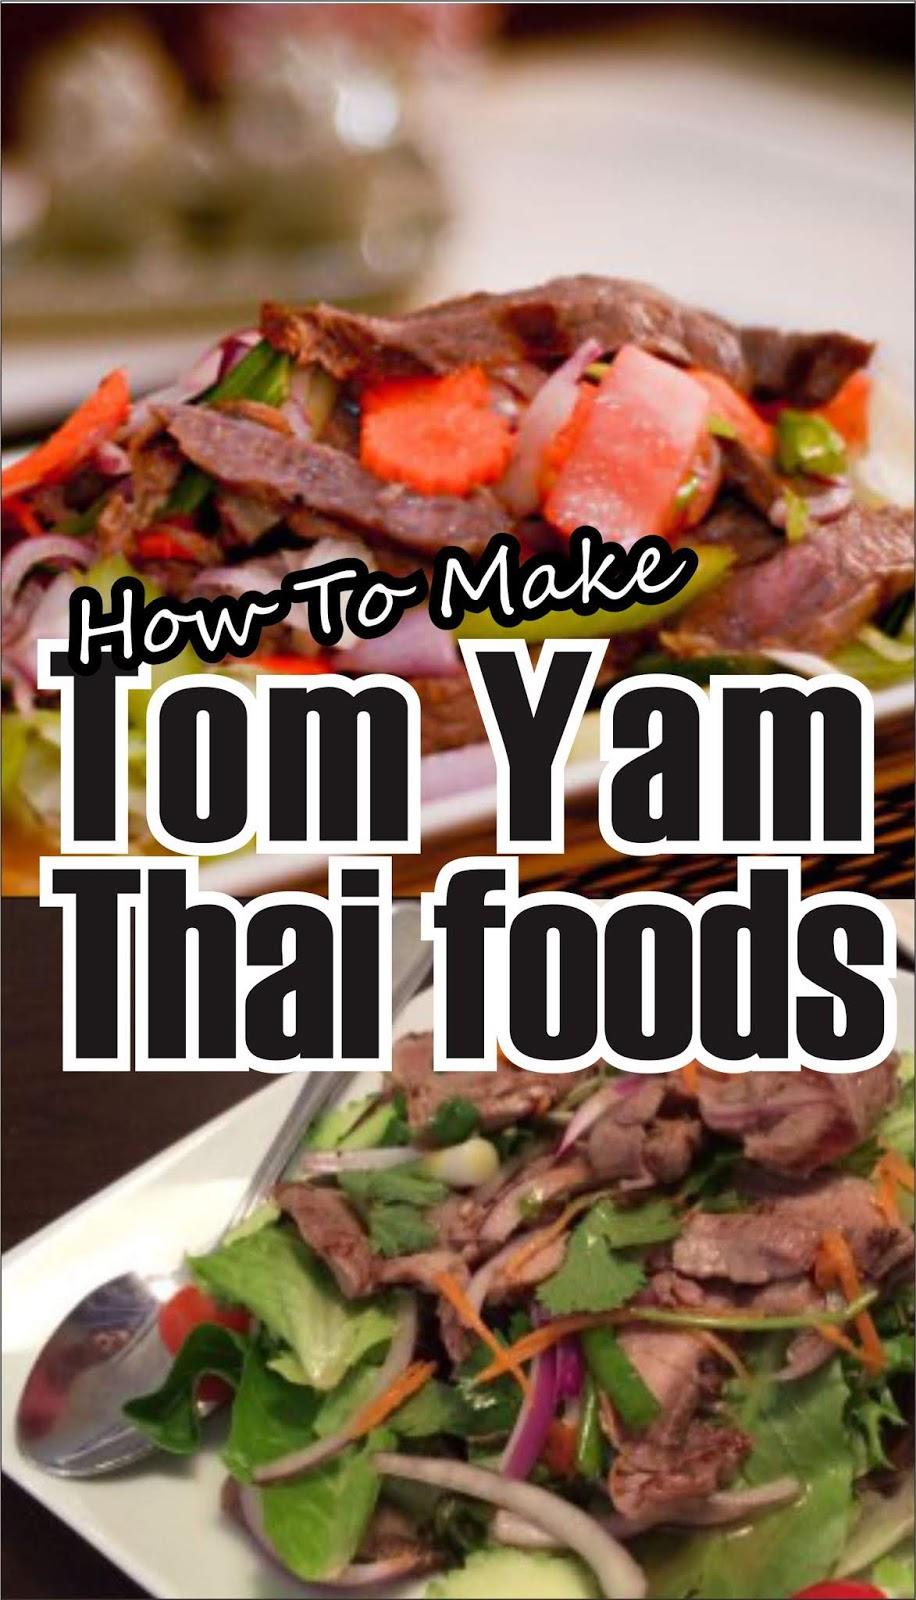 HOW TO MAKE TOM YAM THAI FOODS